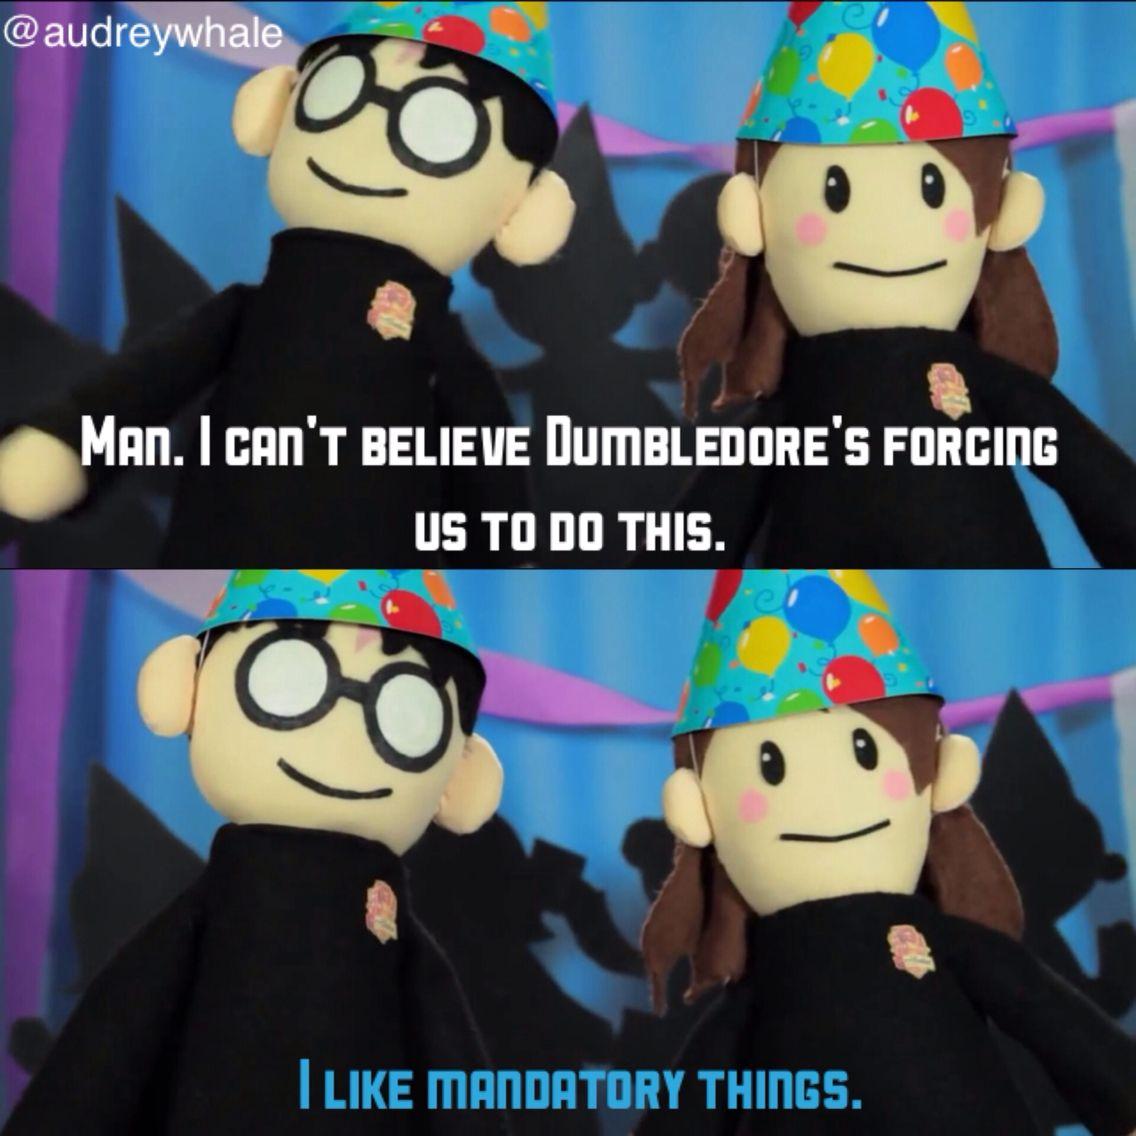 Potter Puppet Pals Aww Harry Potter Puppet Pals Harry Potter Puppets Potter Puppet Pals